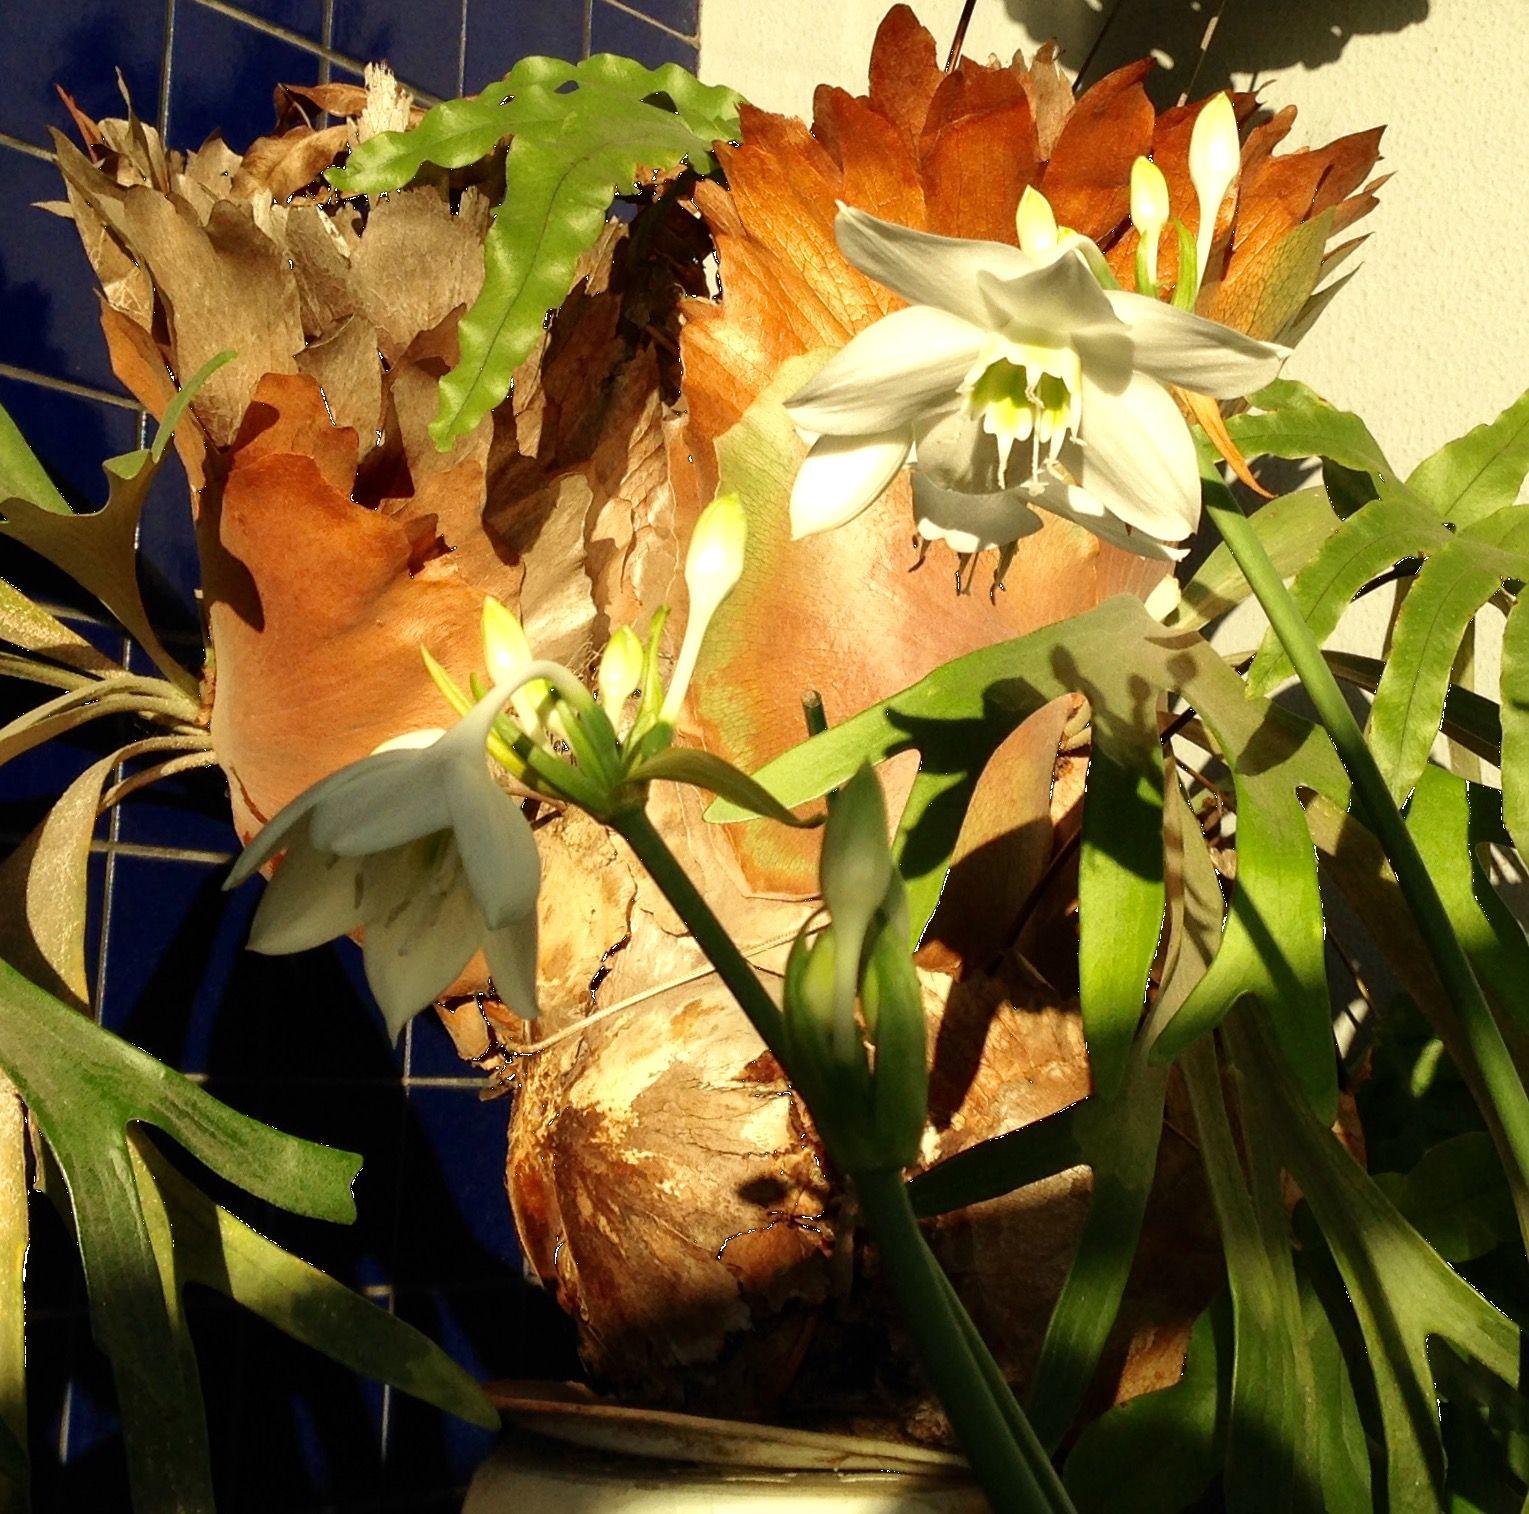 Chifres de Veado e Narcisos